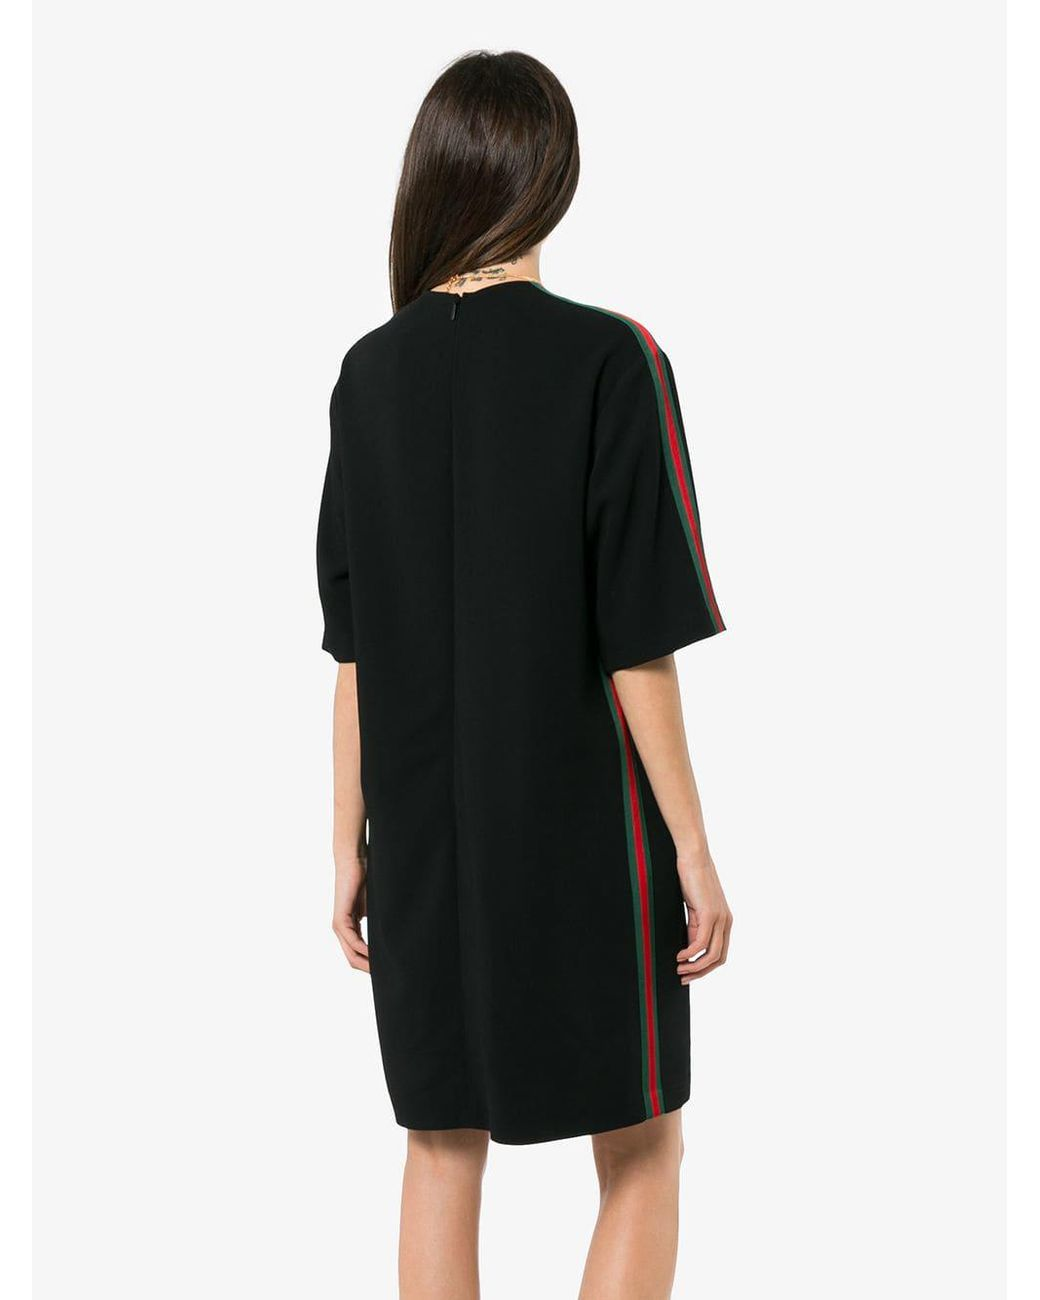 7d870254c3 Gucci Stretch Viscose Tunic Dress With Web in Black - Lyst